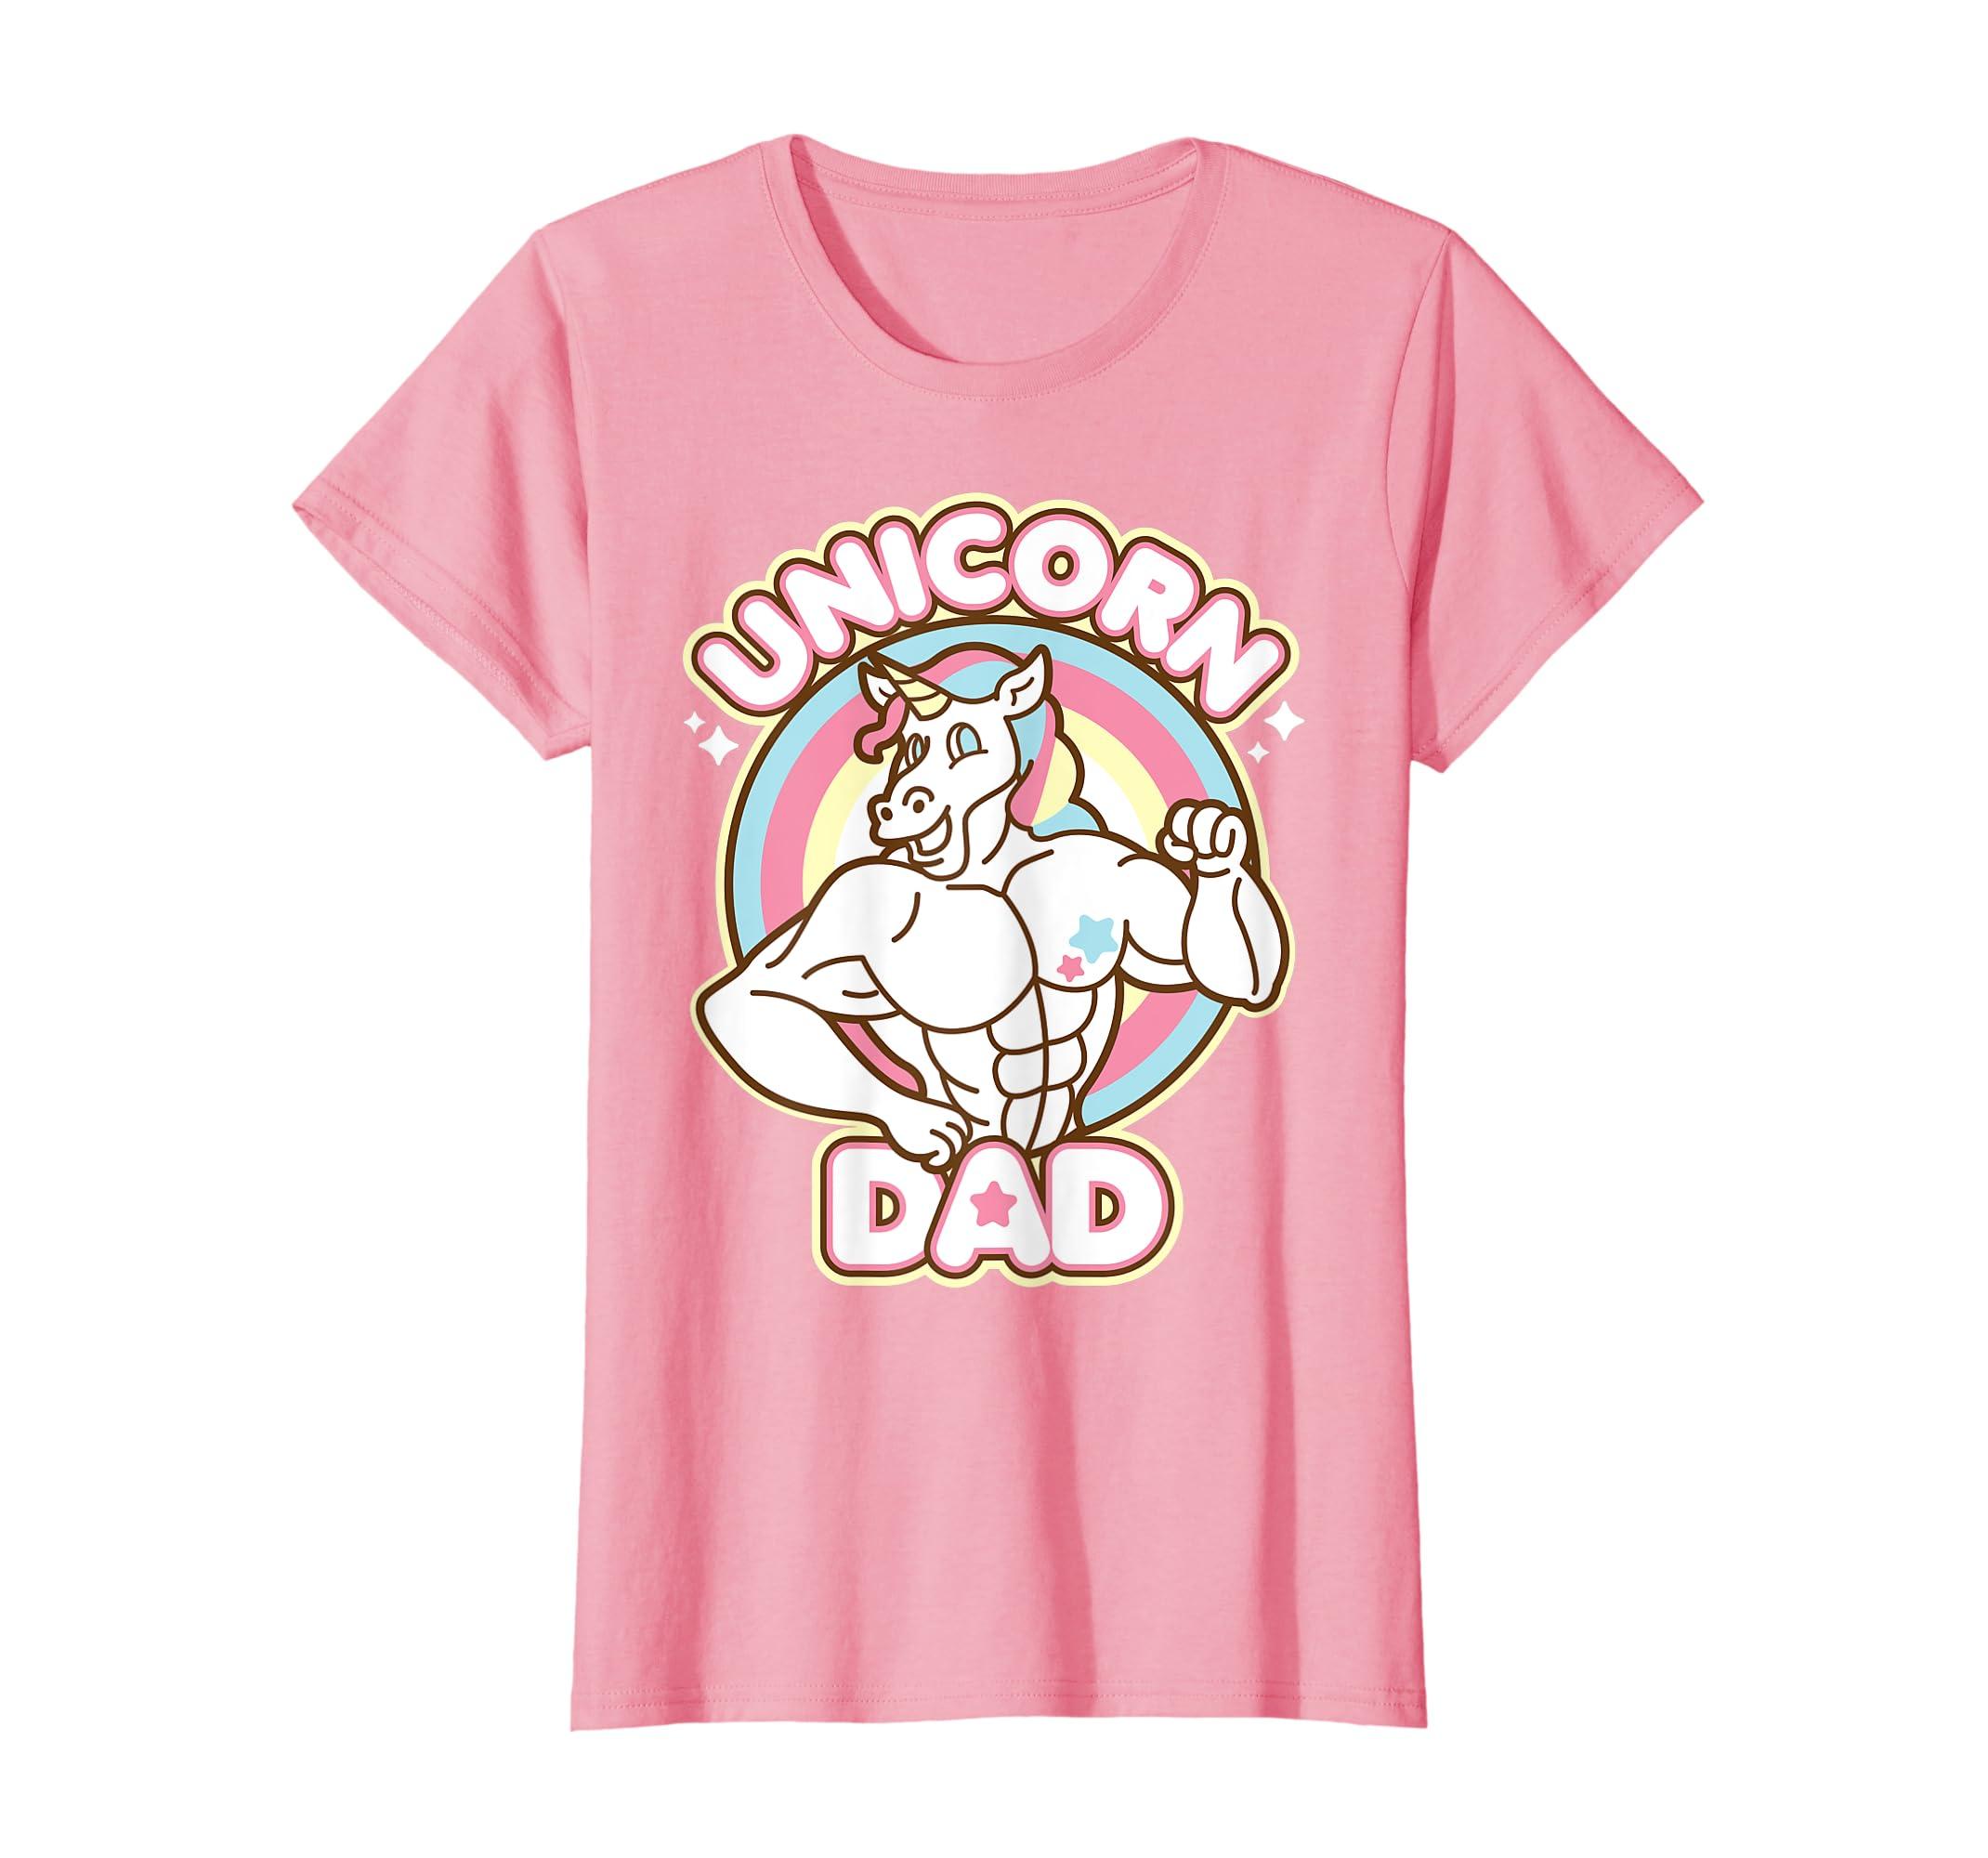 Unicorn Dad Shirt Father's Day Birthday Gift-Yolotee